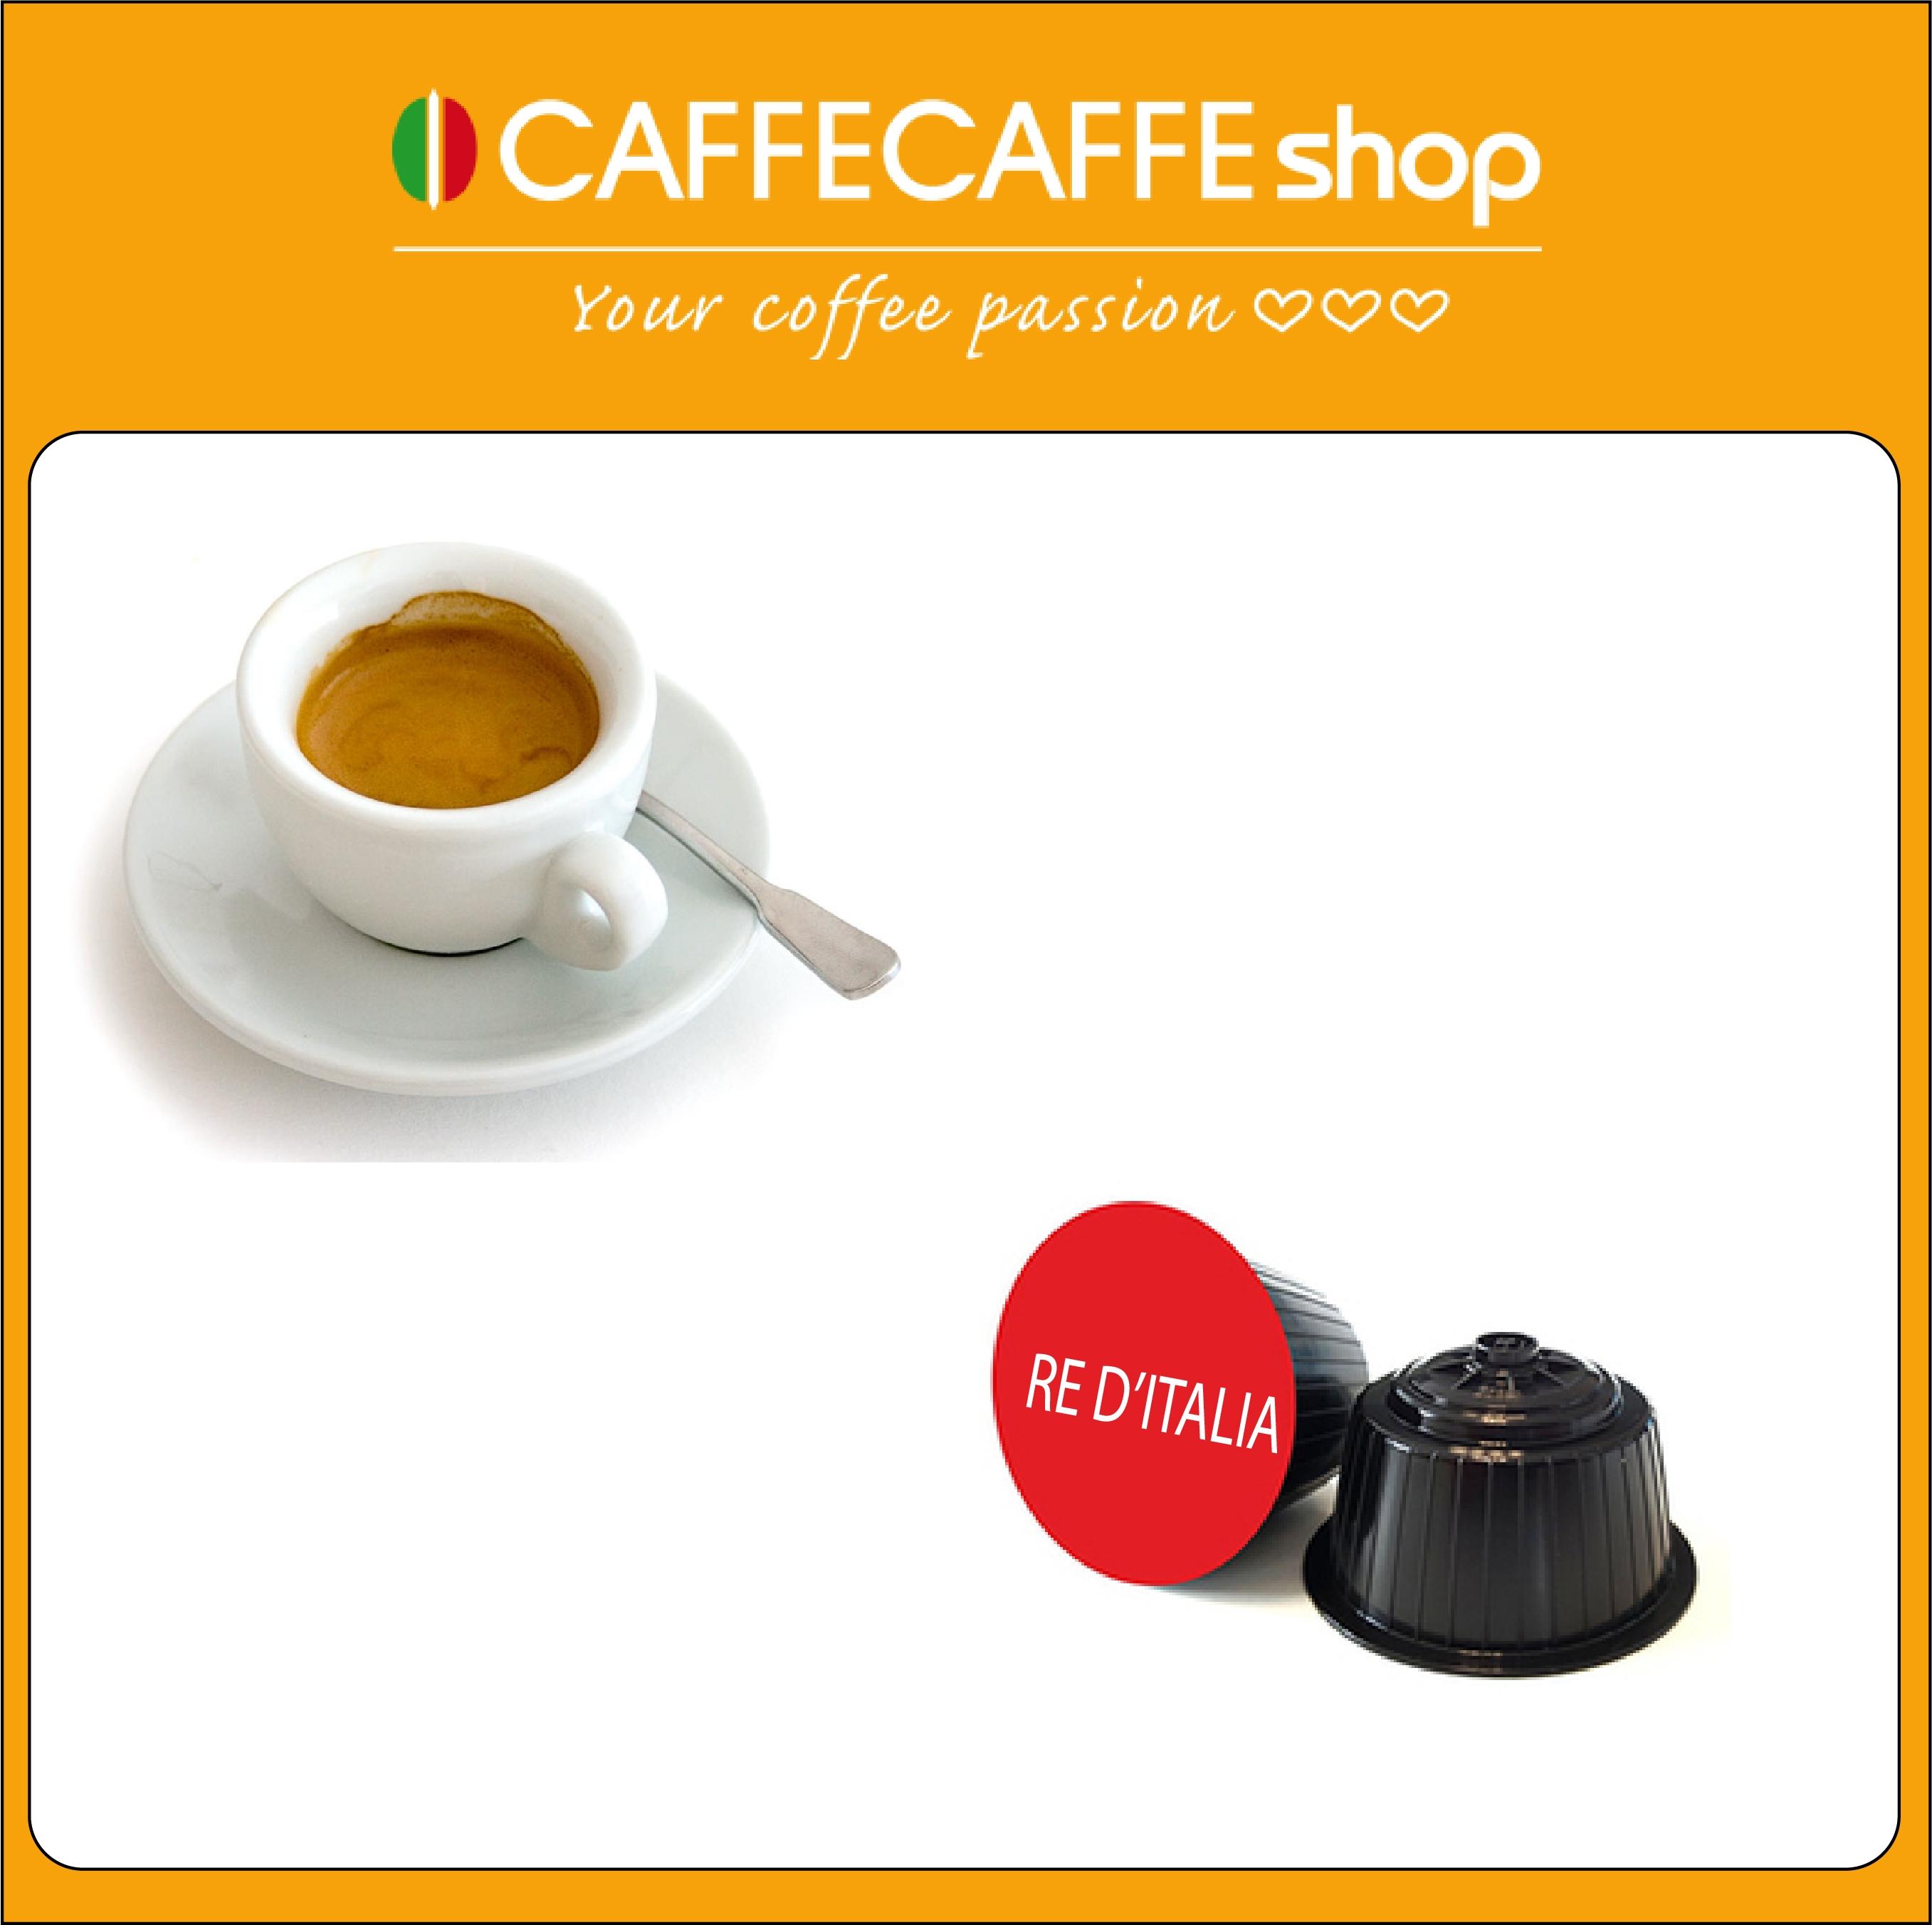 Caffecaffeshop